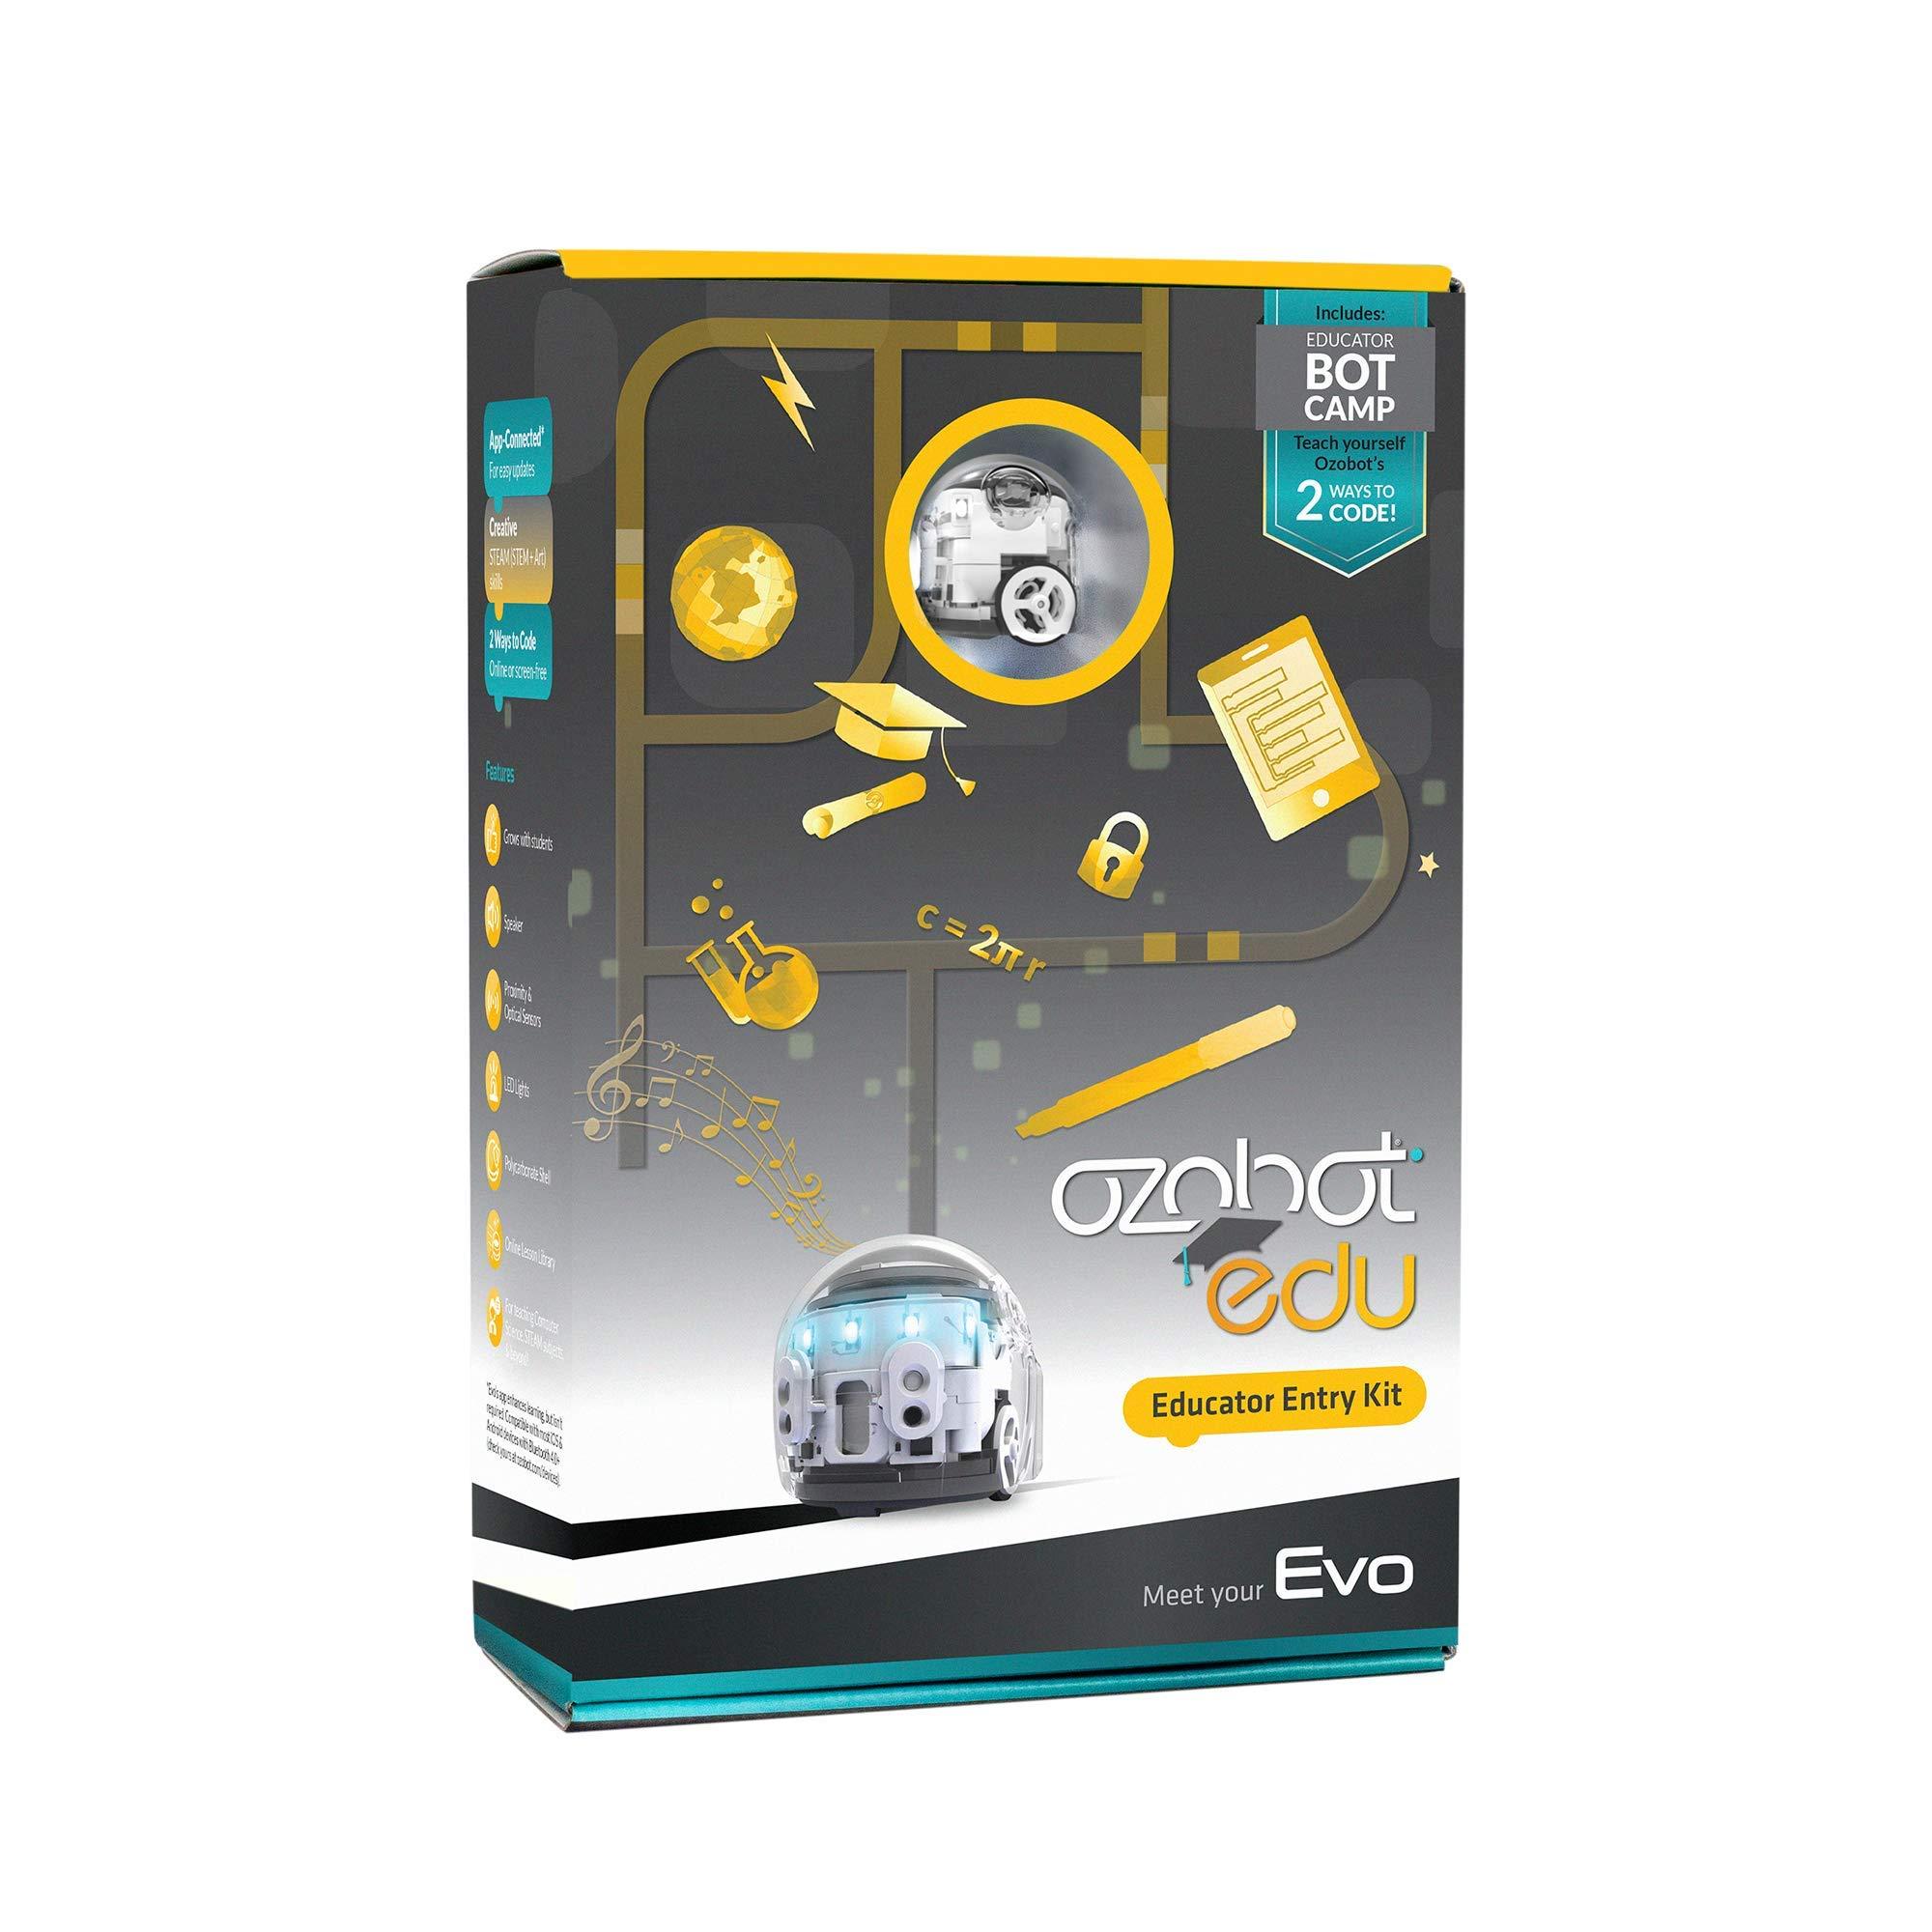 Ozobot Evo Educator Entry Kit - BLE Coding Robot & Teacher Training in 2 Ways to Code - STEM & STEAM for Grades K-12 (White) by Ozobot